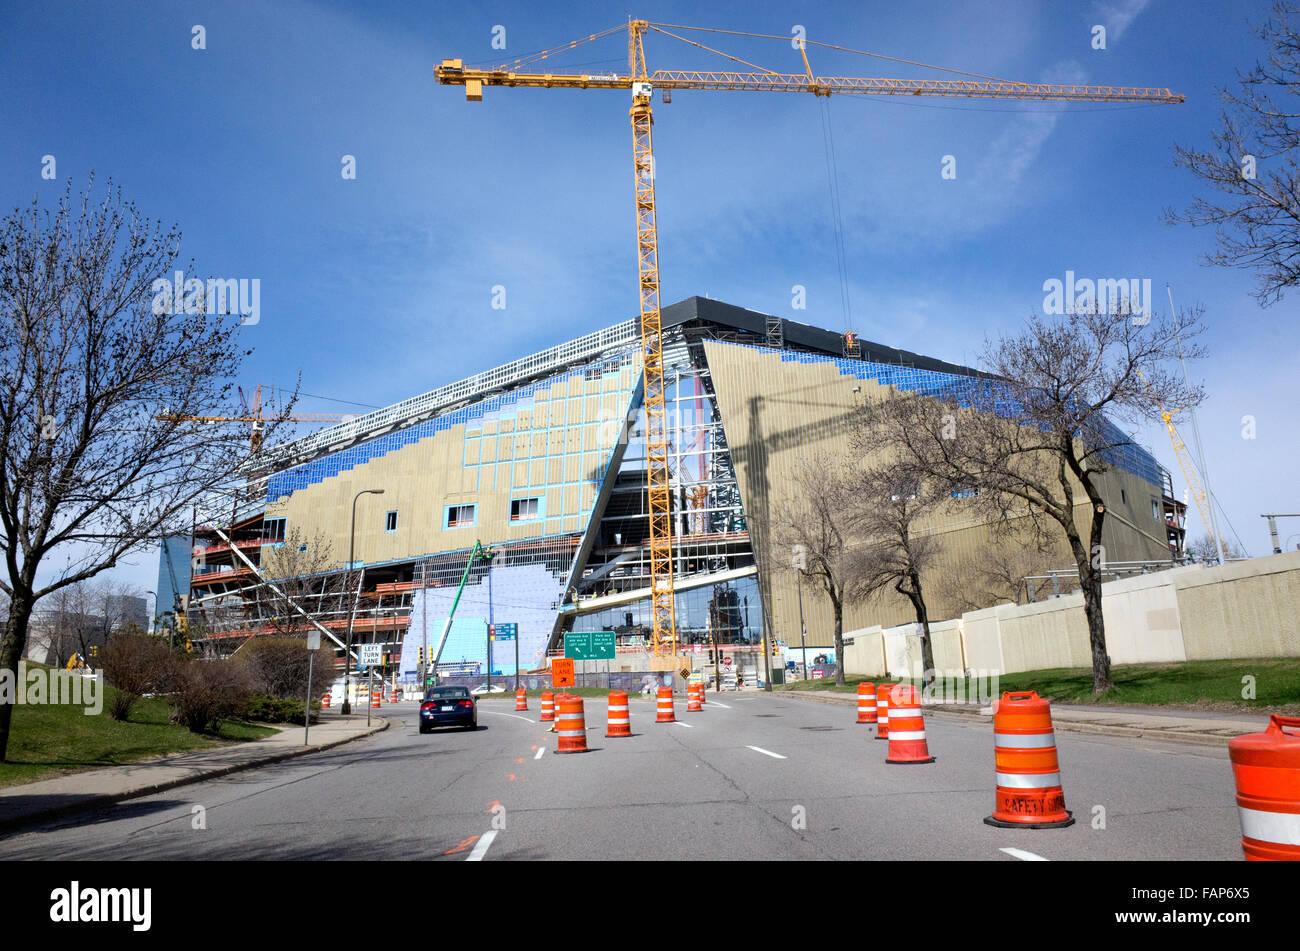 Construction of The NFL Minnesota Viking U.S. Bank Stadium April 15th 2015. Minneapolis Minnesota MN USA - Stock Image